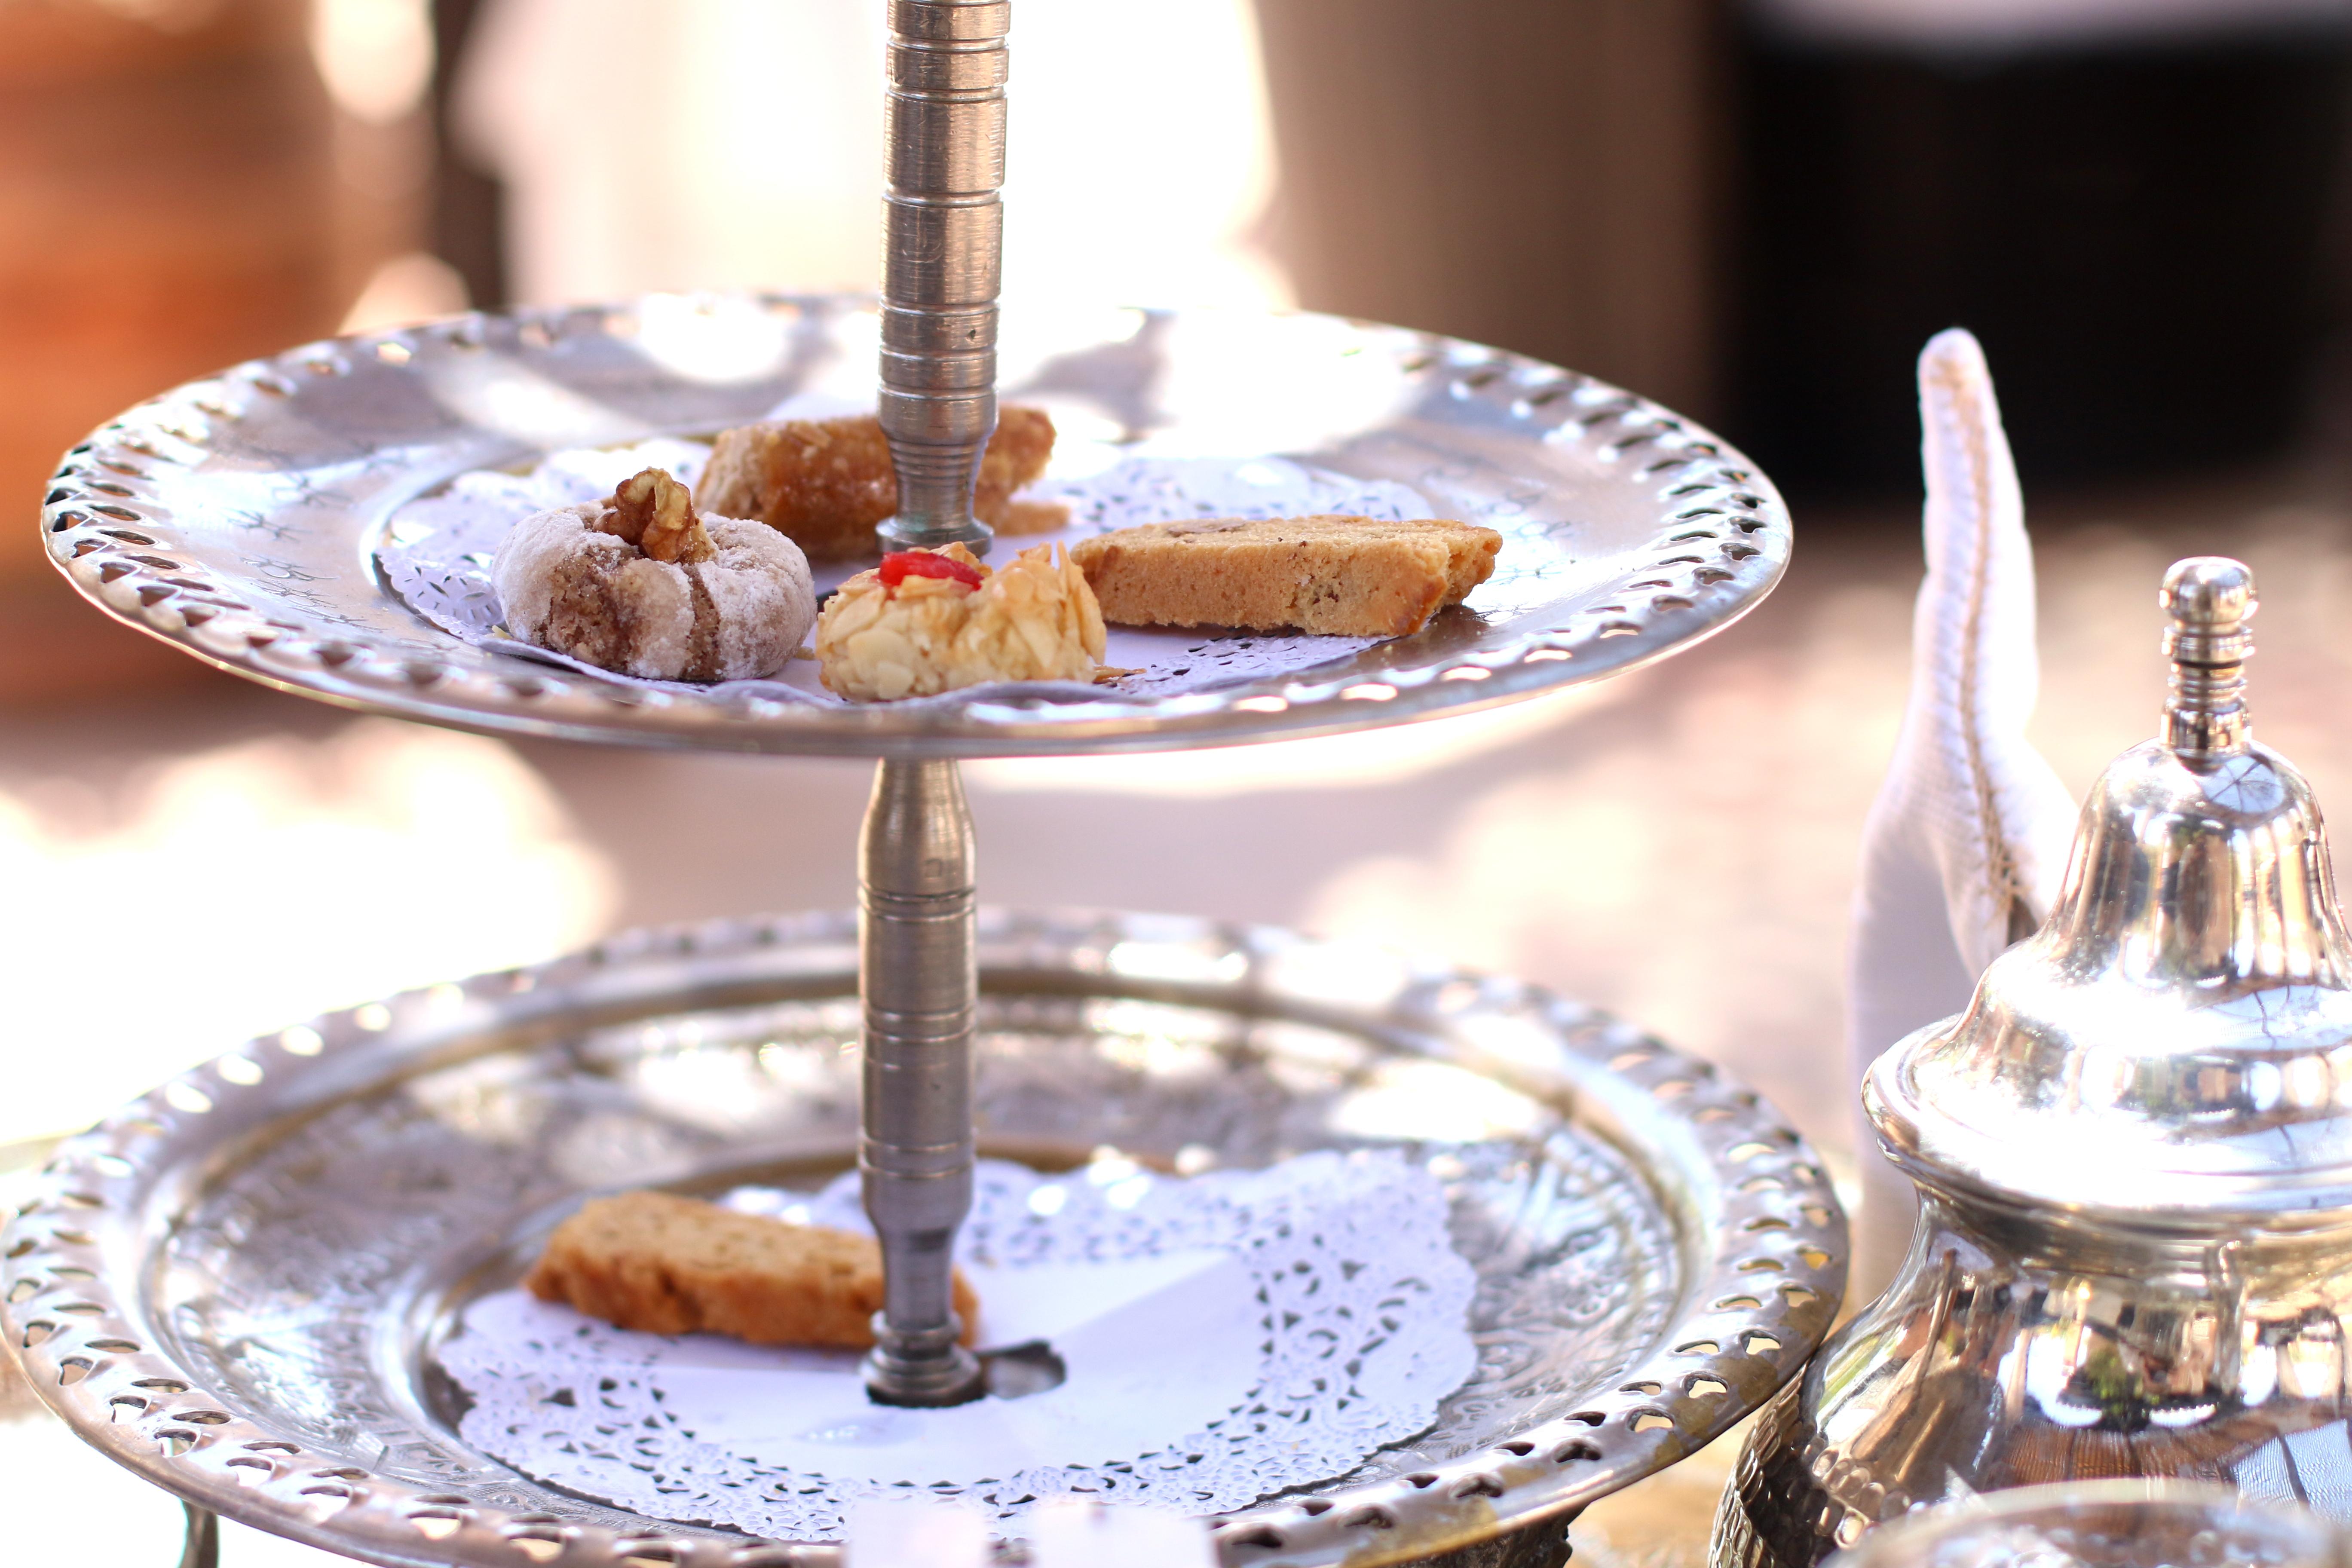 la sultana marrakech marrakesch rooftop terrace mint tea moroccan tea hotel review